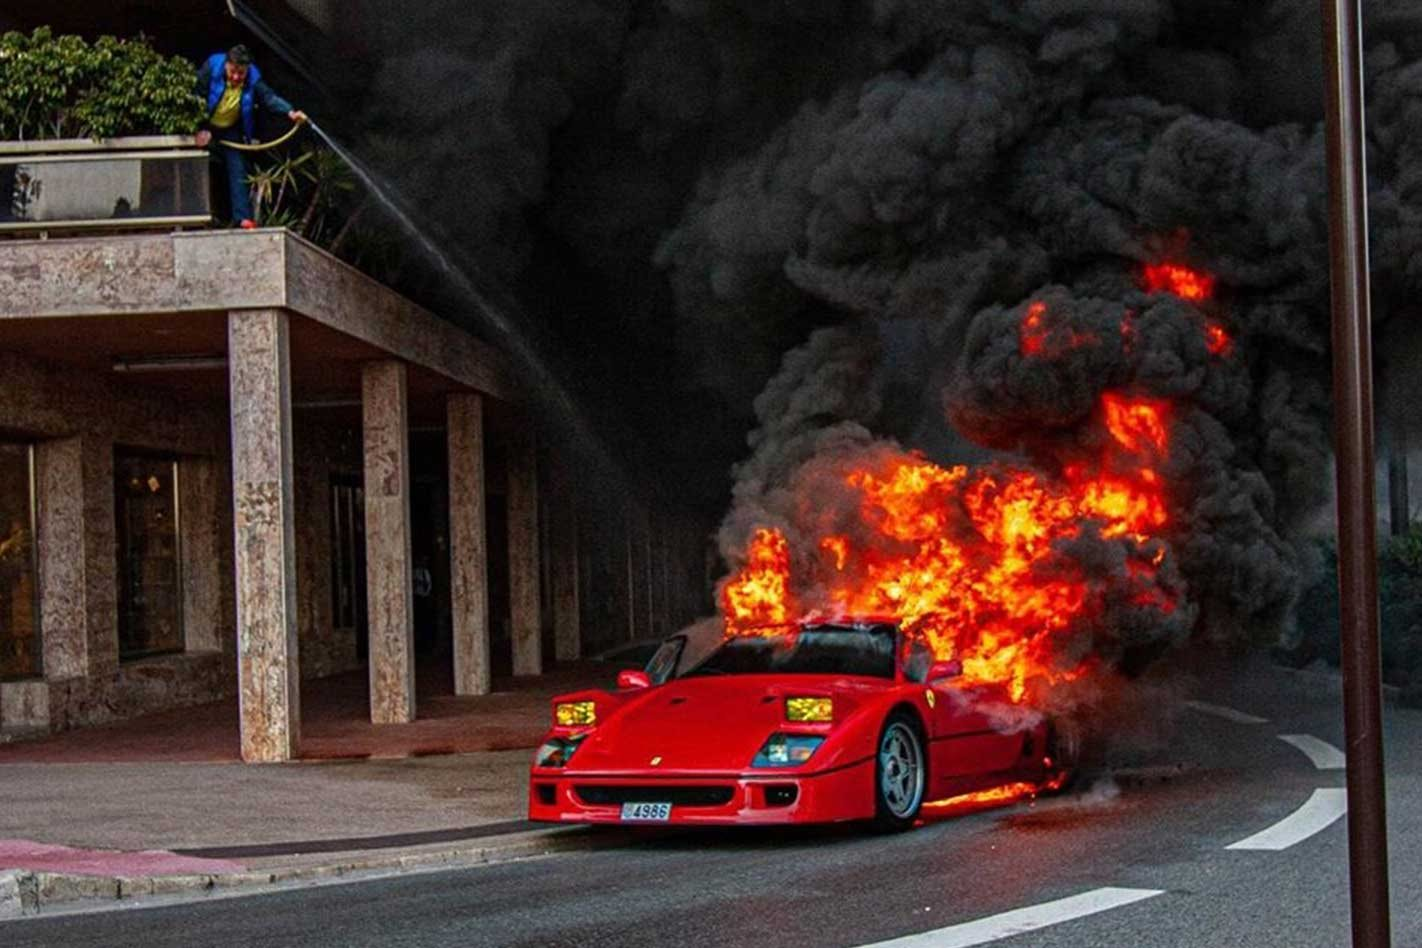 Video captures a Ferrari F40 burning down in Monaco